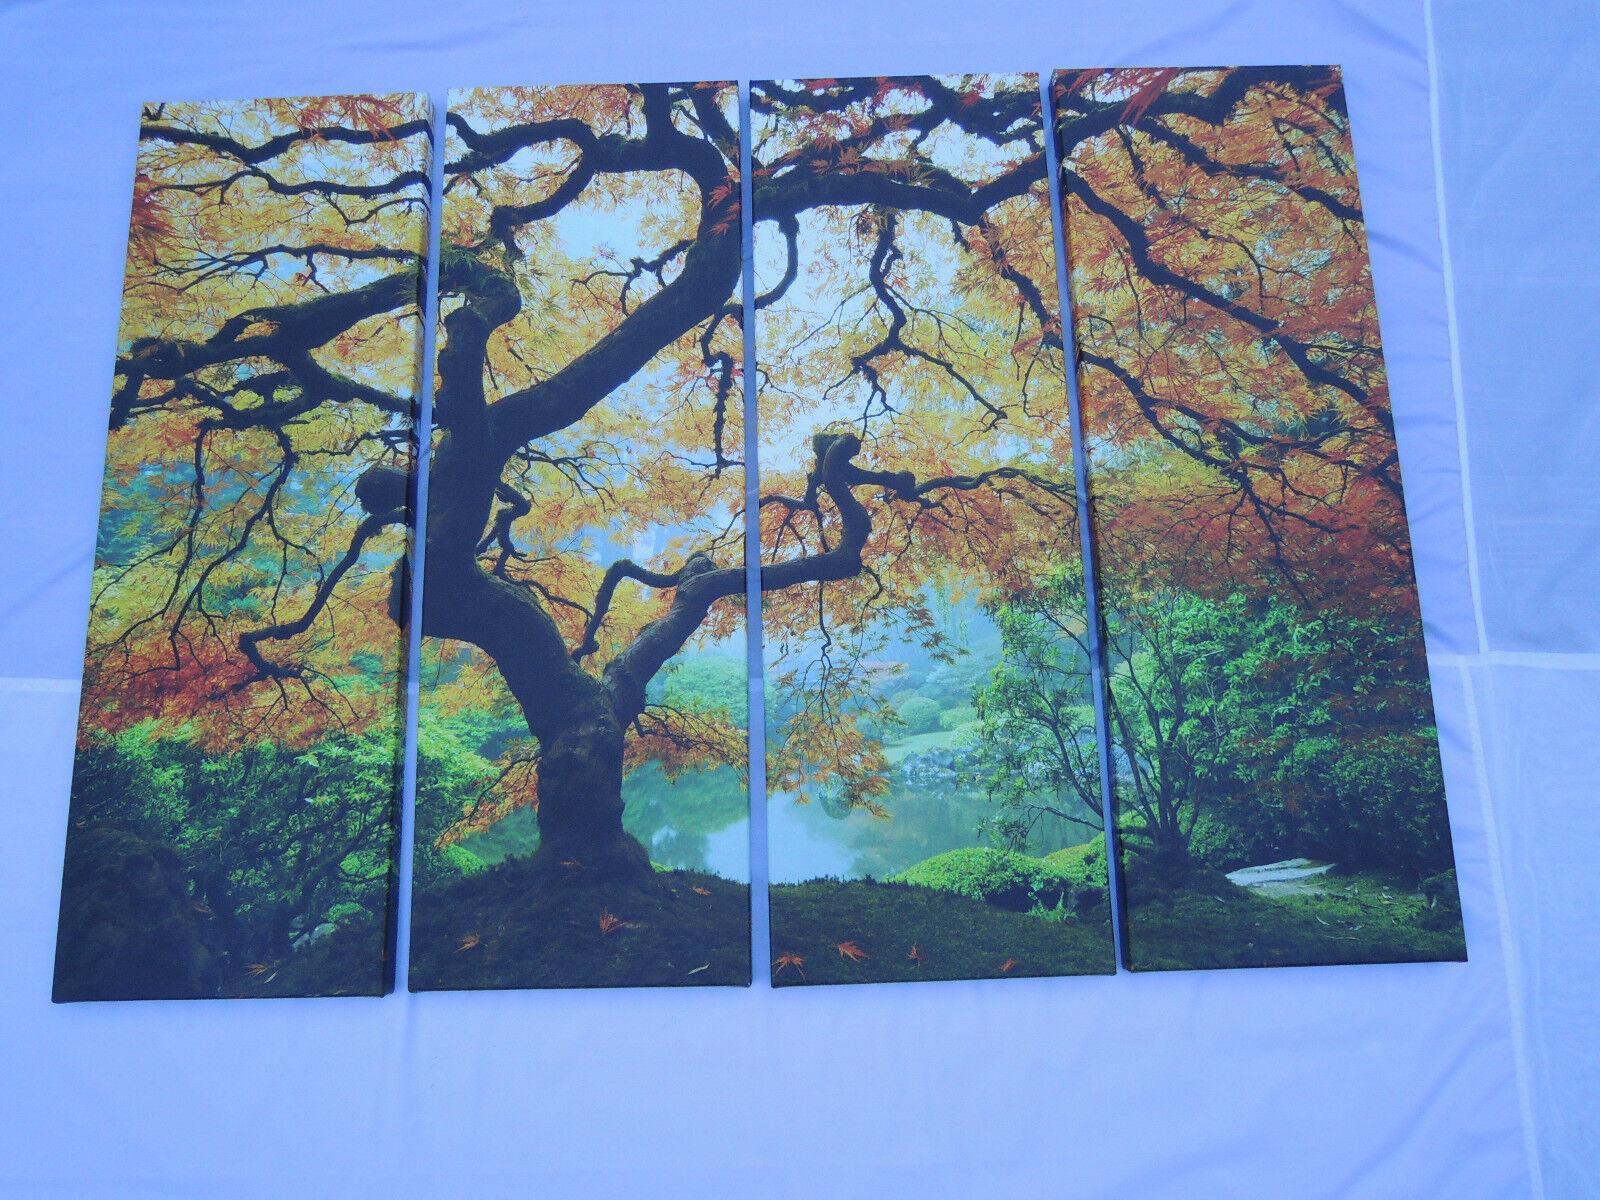 Kanchanaburi Erawan Waterfall 3 Piece Photographic Print On Wrapped Canvas Set For Sale Online Ebay